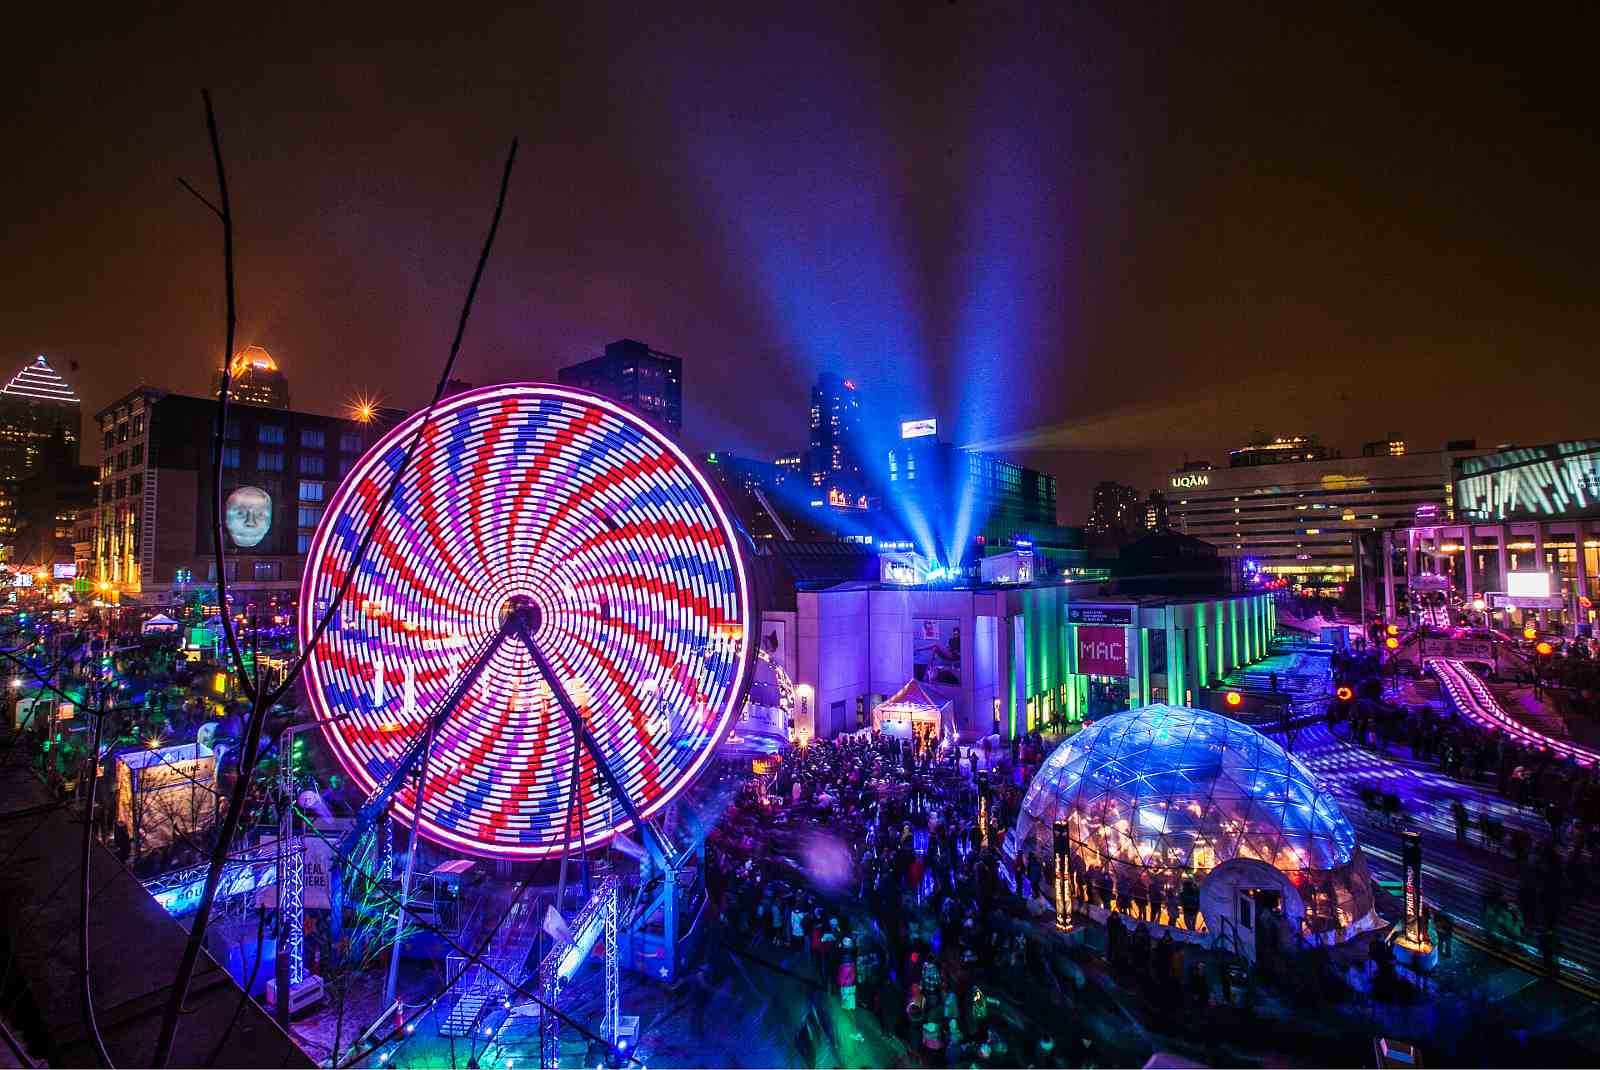 festival of light berlin 2019